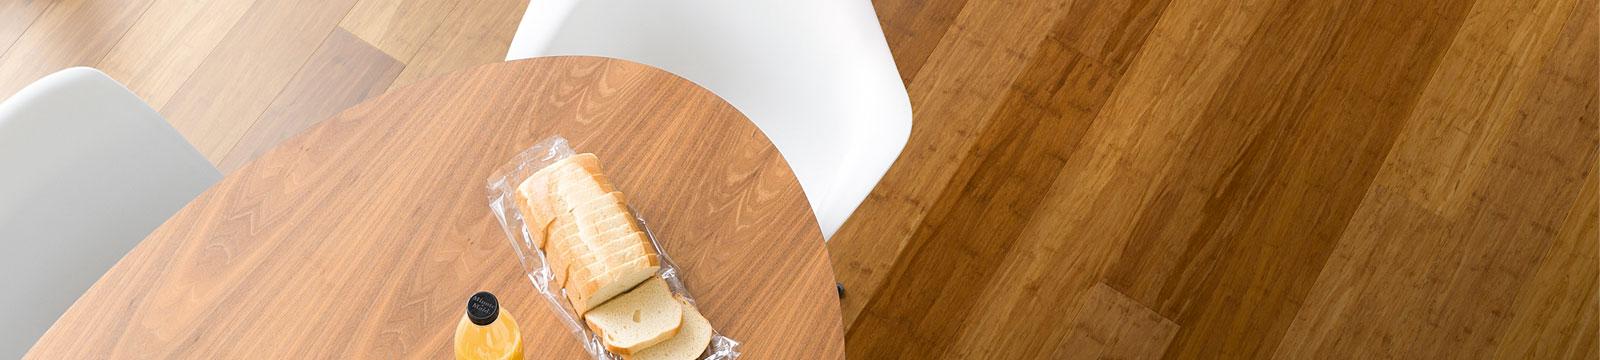 Quick-Step Bamboo Flooring